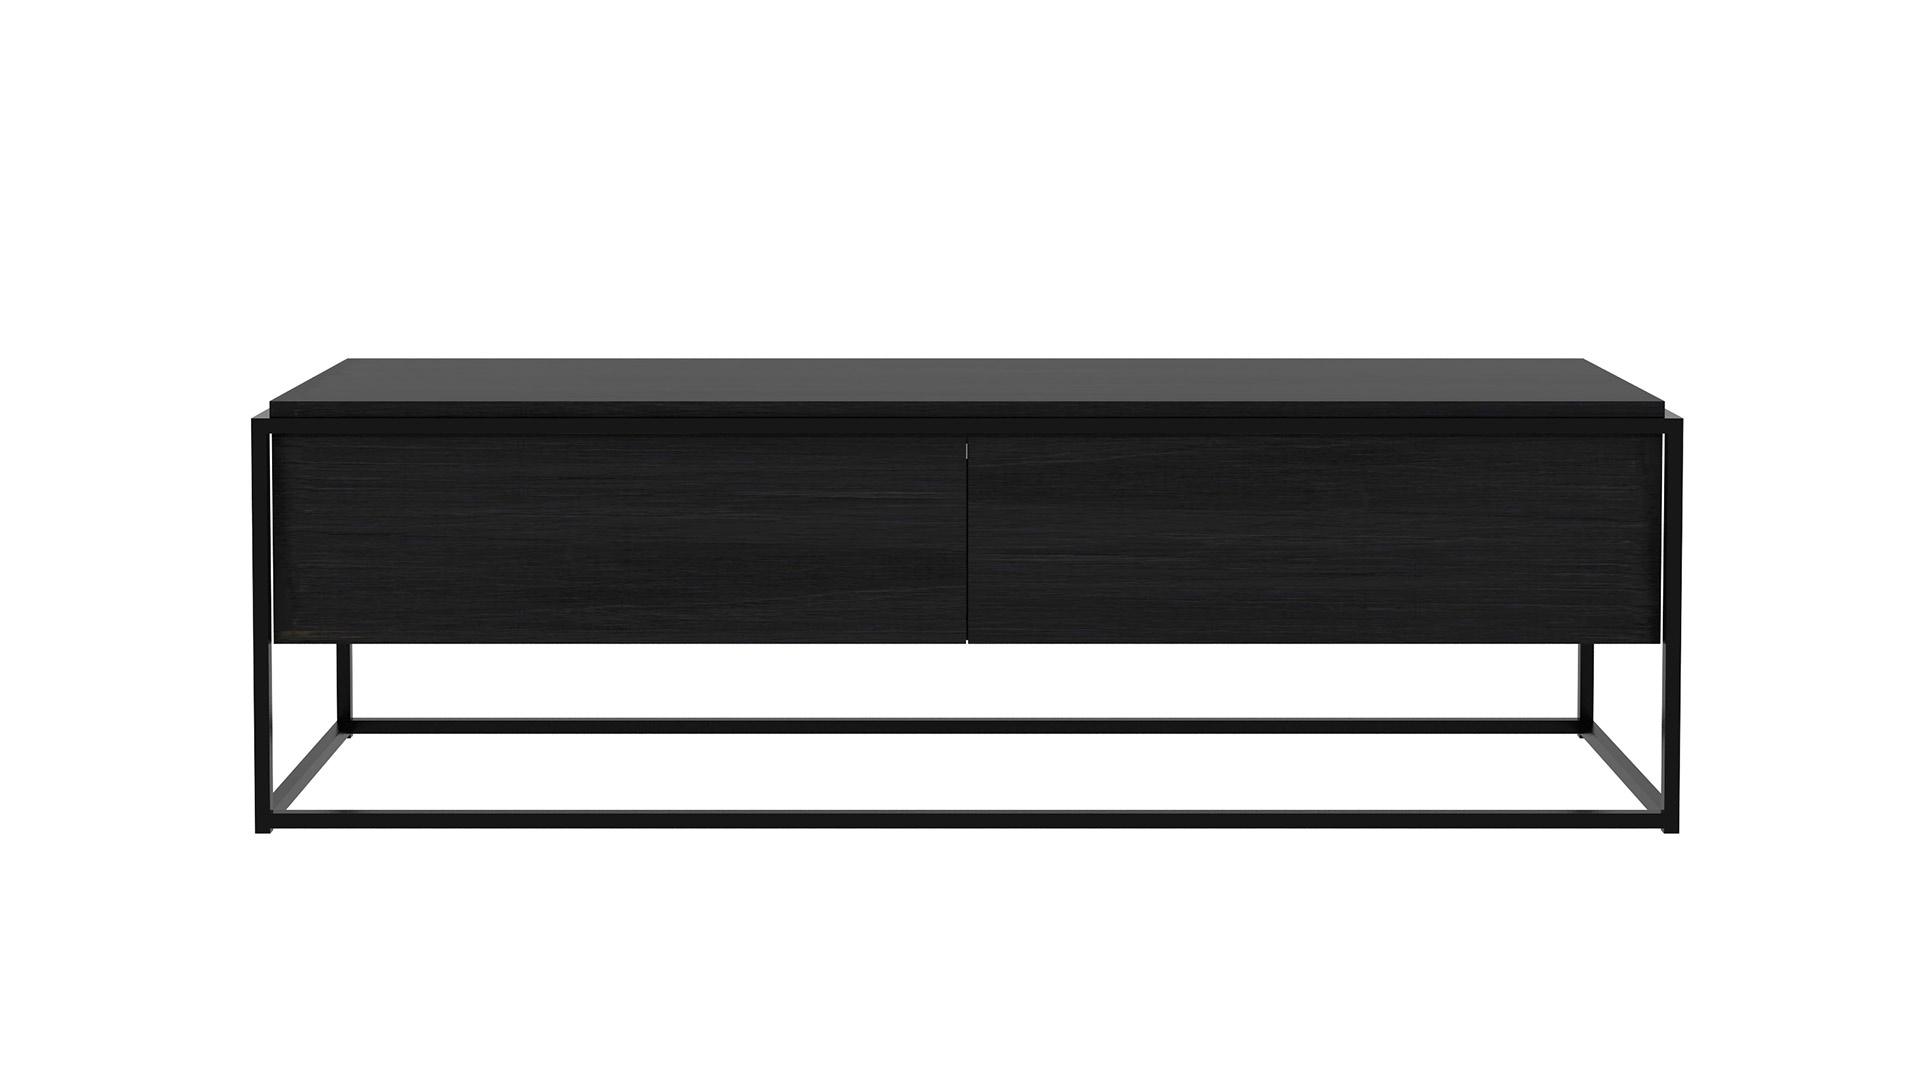 Ethnicraft-Monolit-low-cupboard-Black Oak with black frame